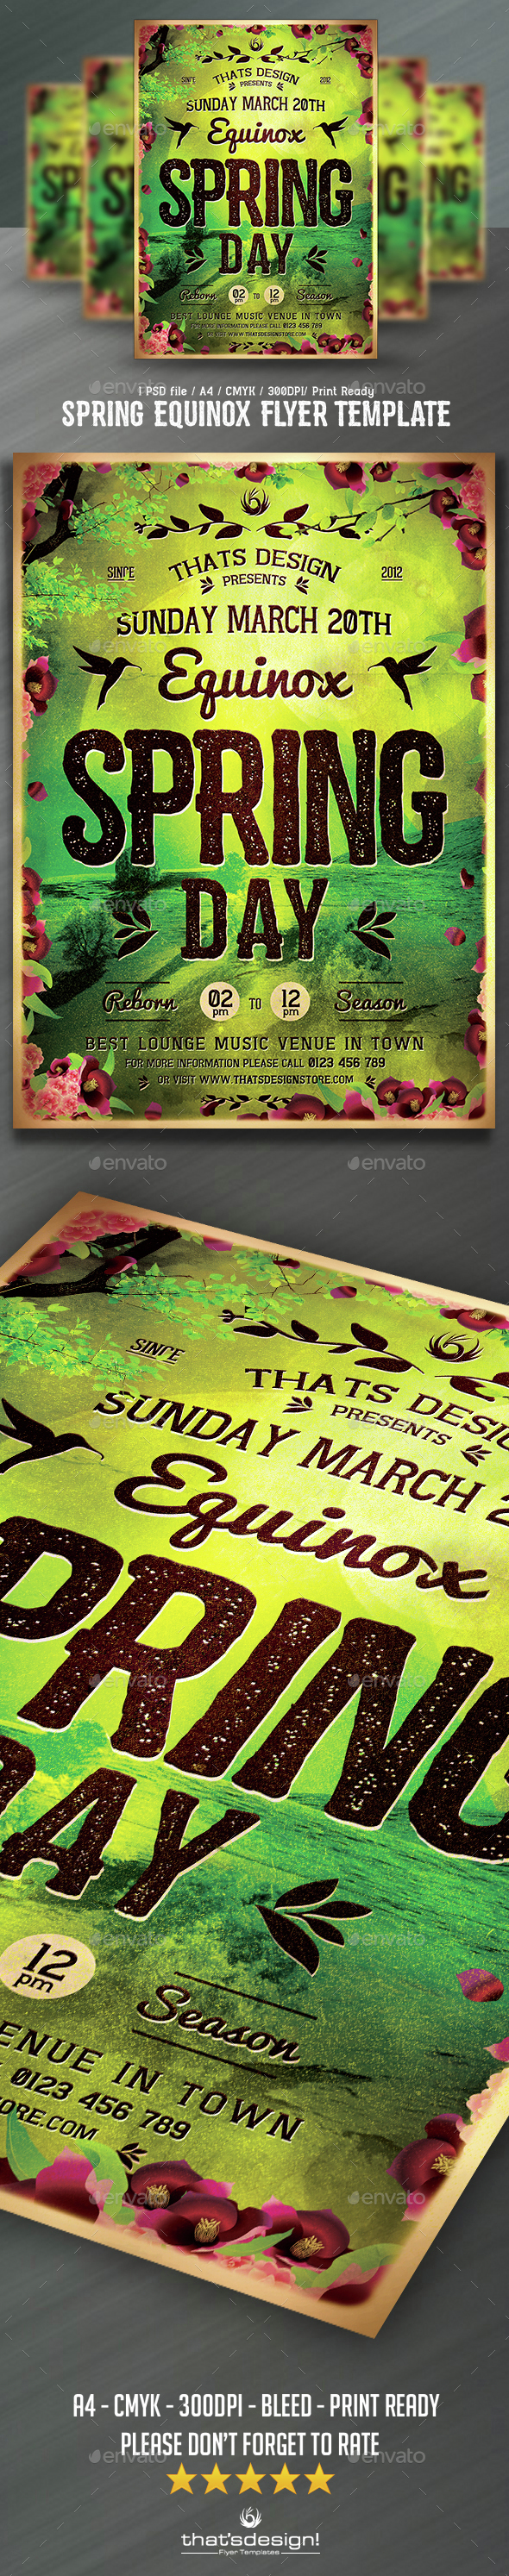 equinox flyers equinox flyers Dolapmagnetbandco